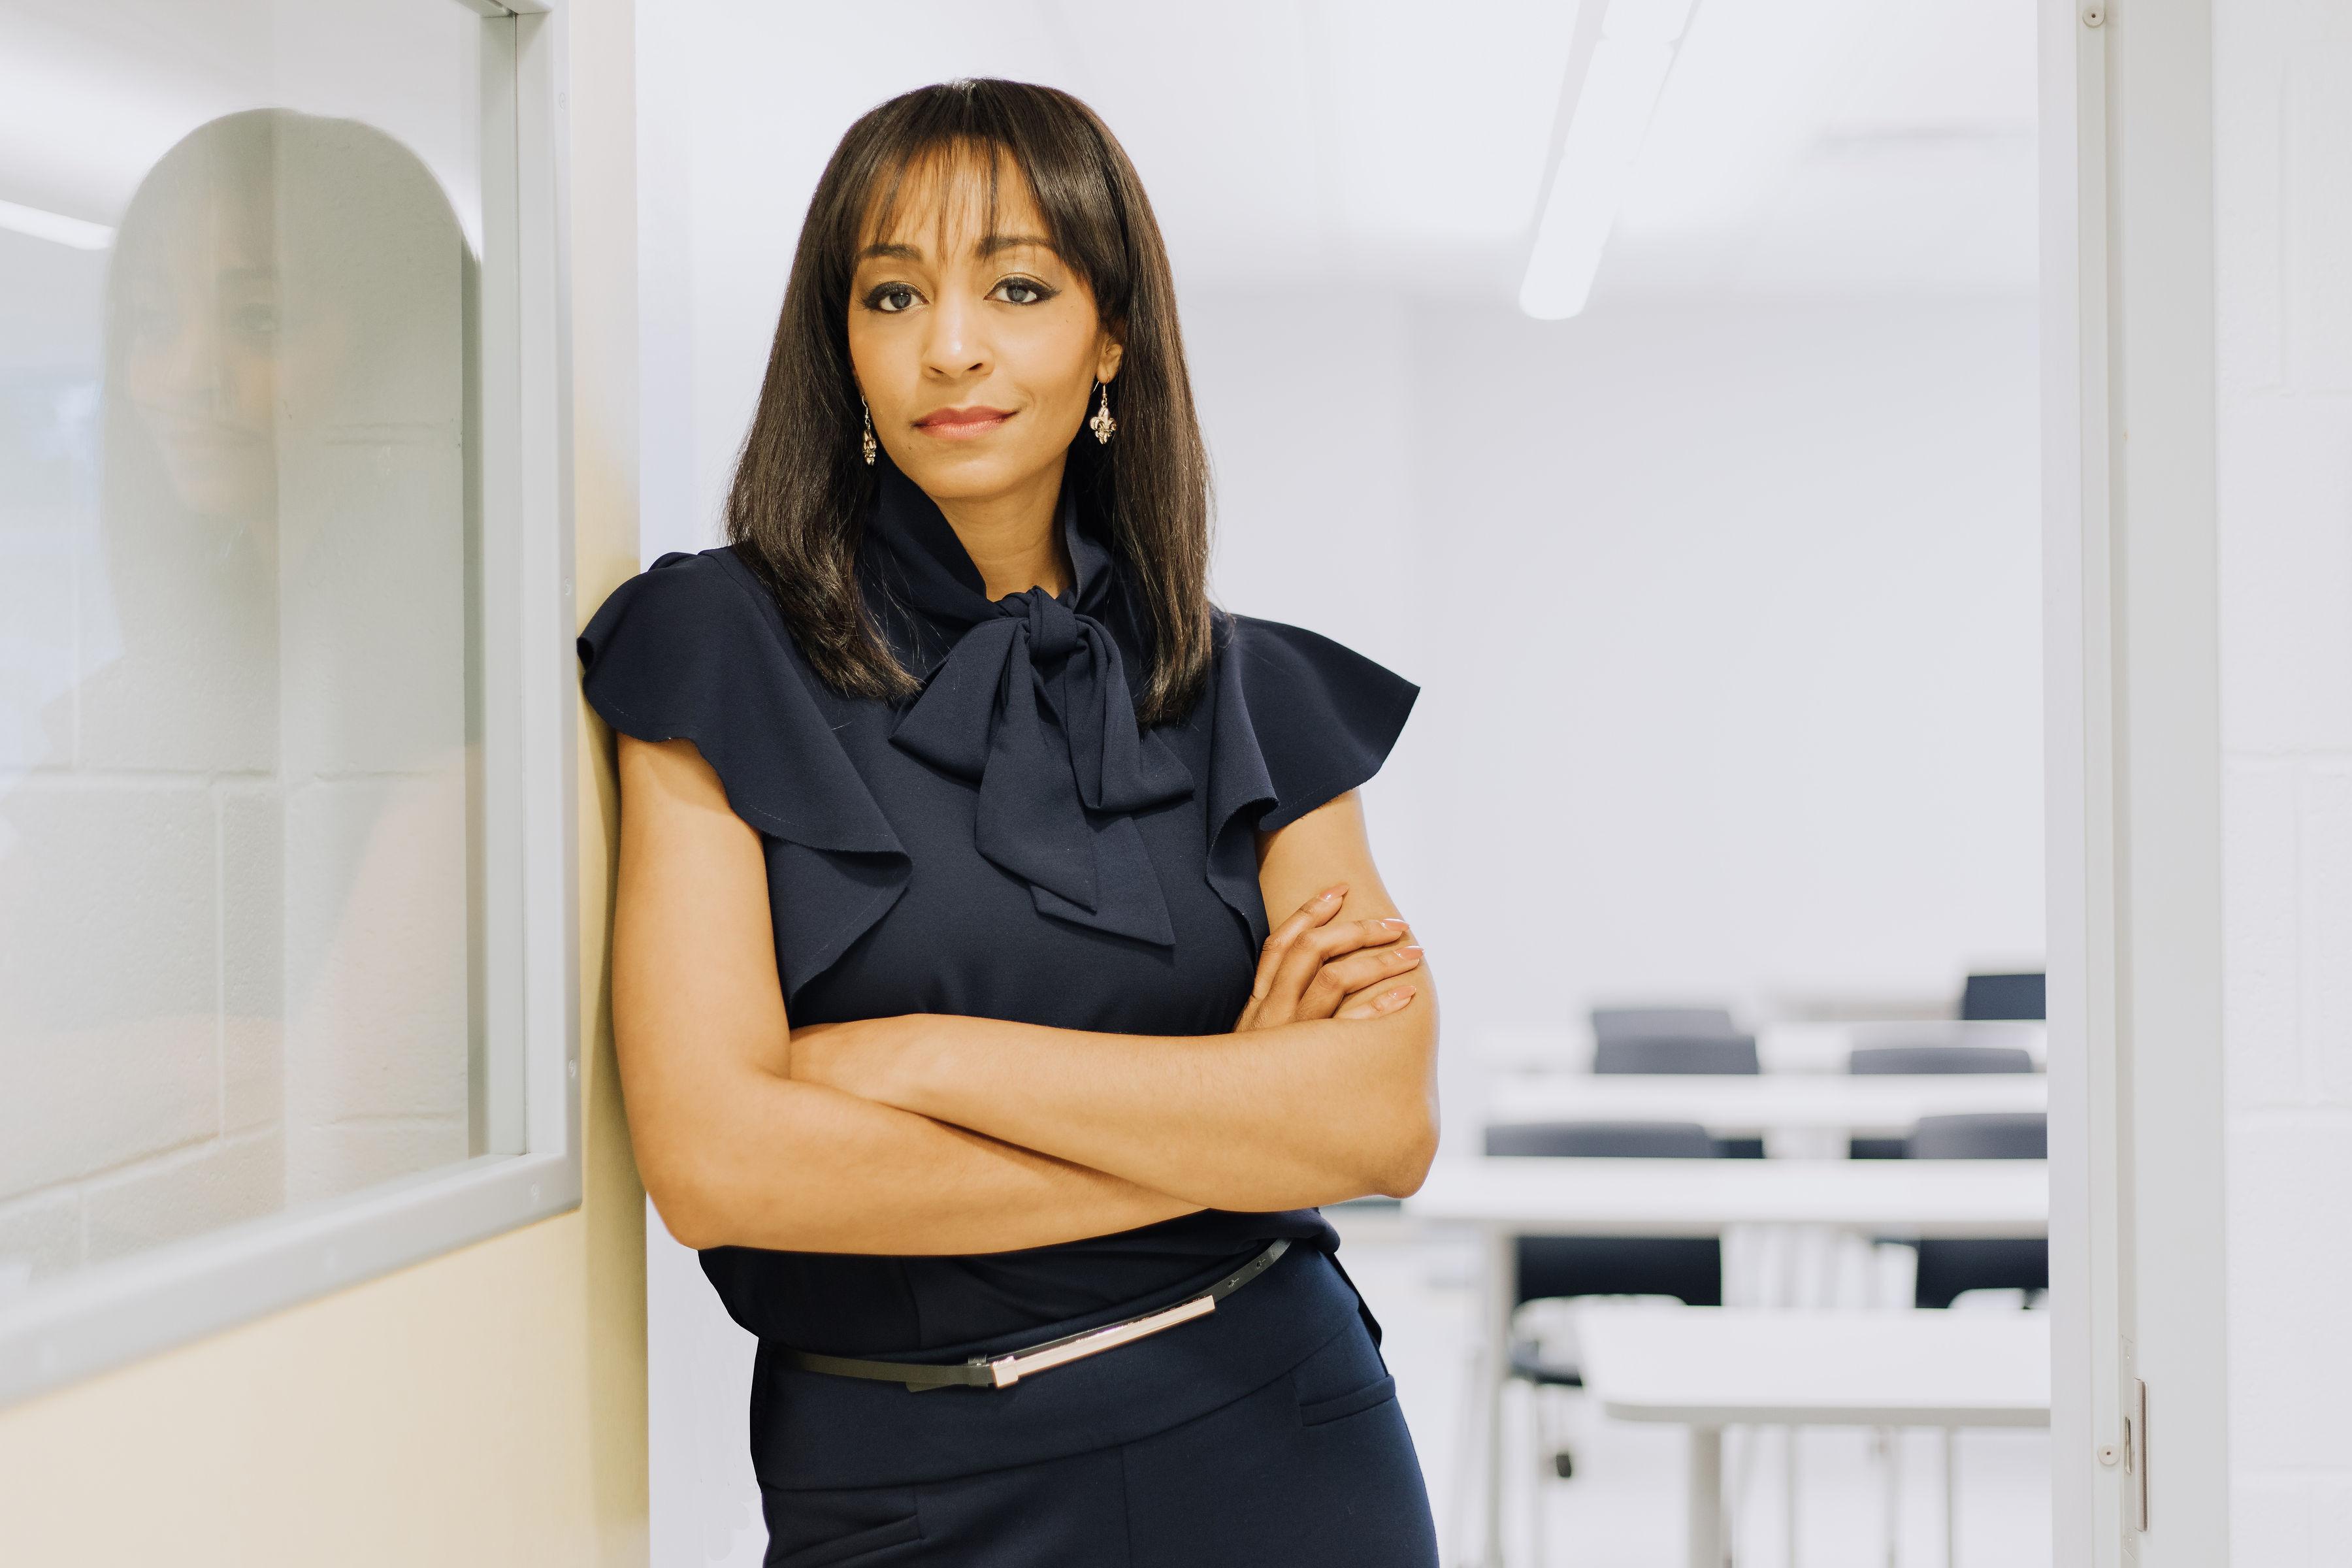 Dr. Melva K. Williams